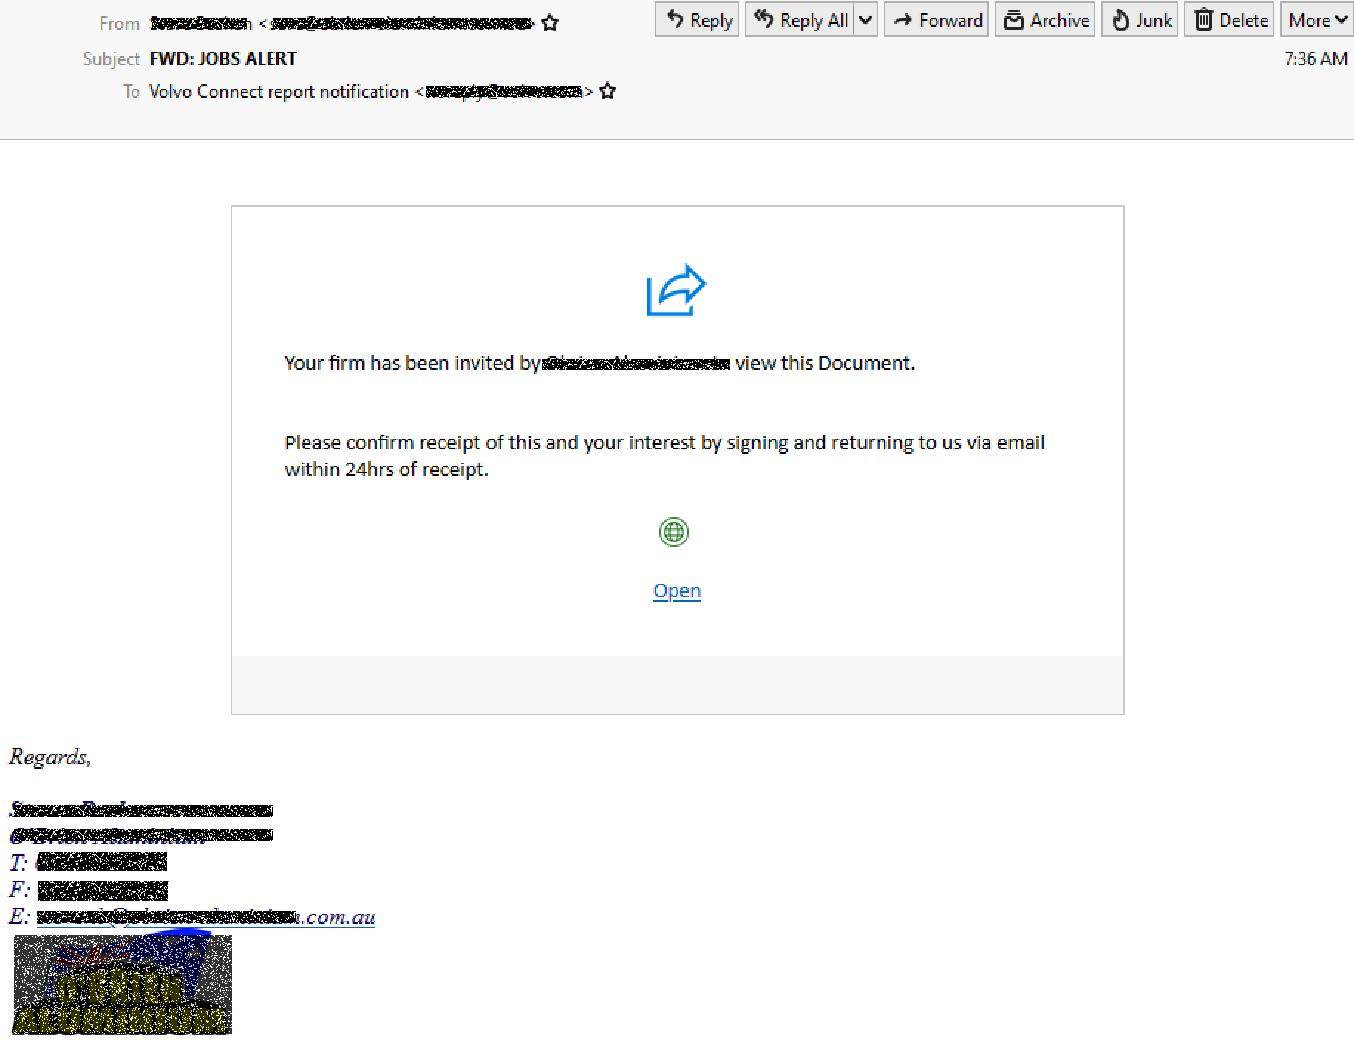 jobs-alert-email-01